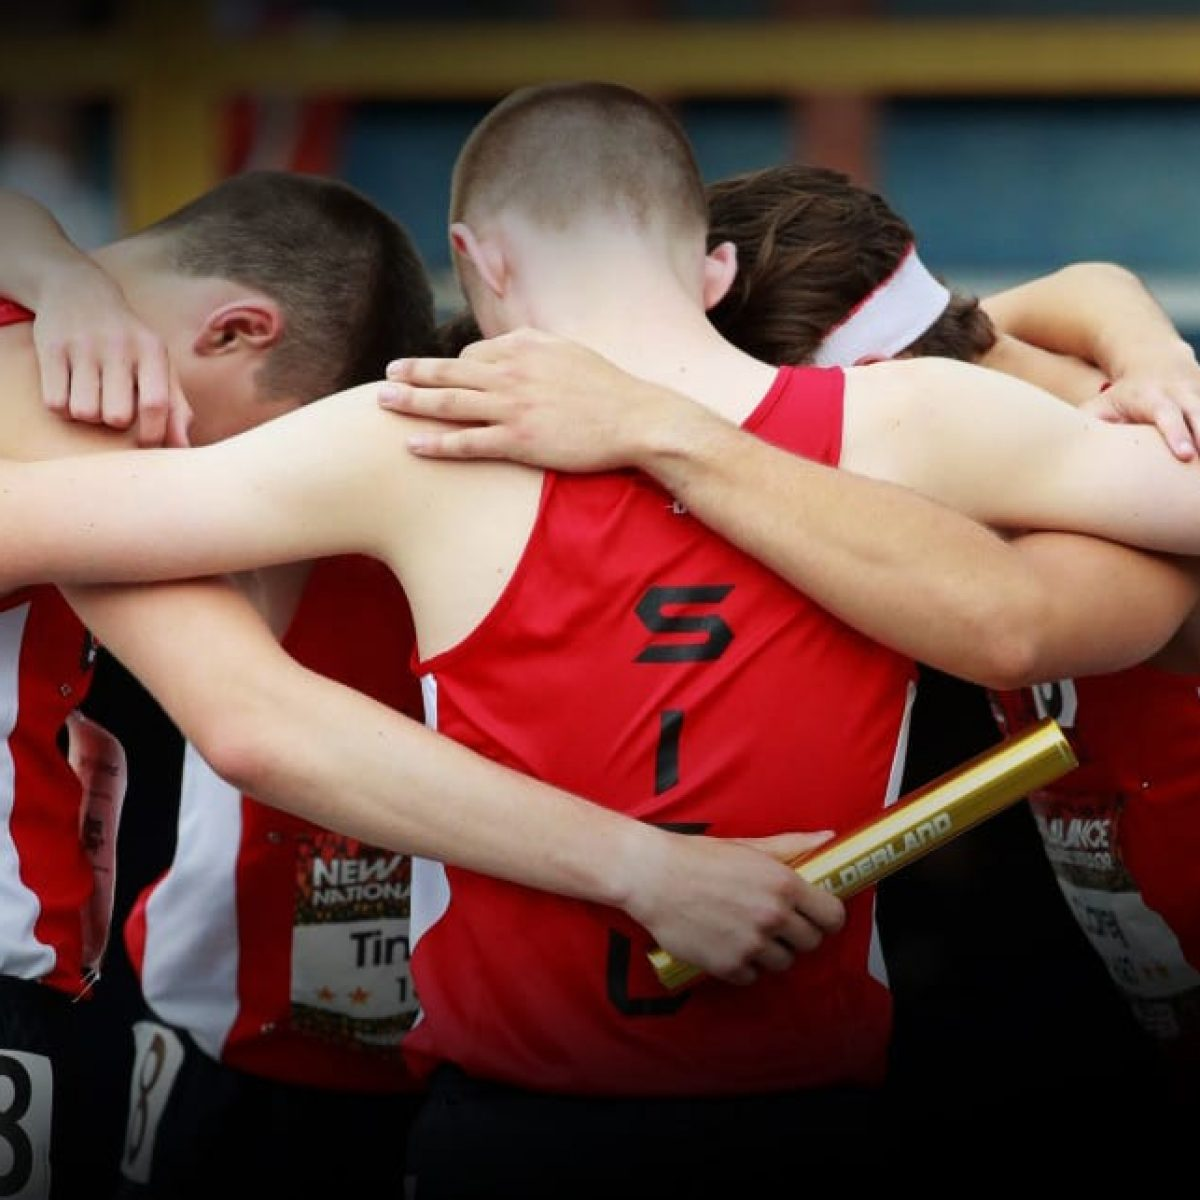 Track Team with Personalized relay baton (RelayBatons.com)